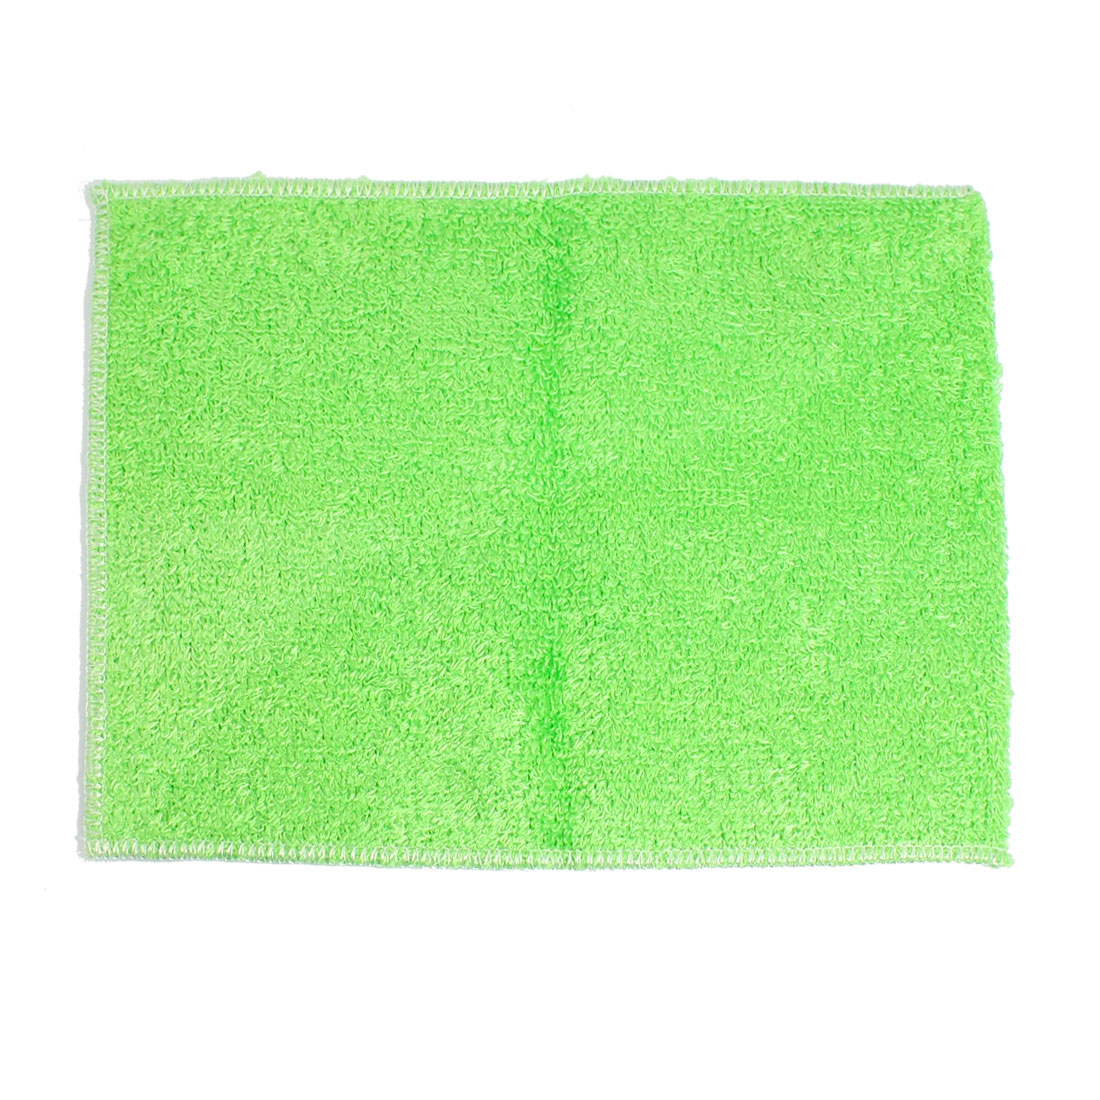 Green Artificial Fibre Softness Hand Face Cleaning Towel Cloth